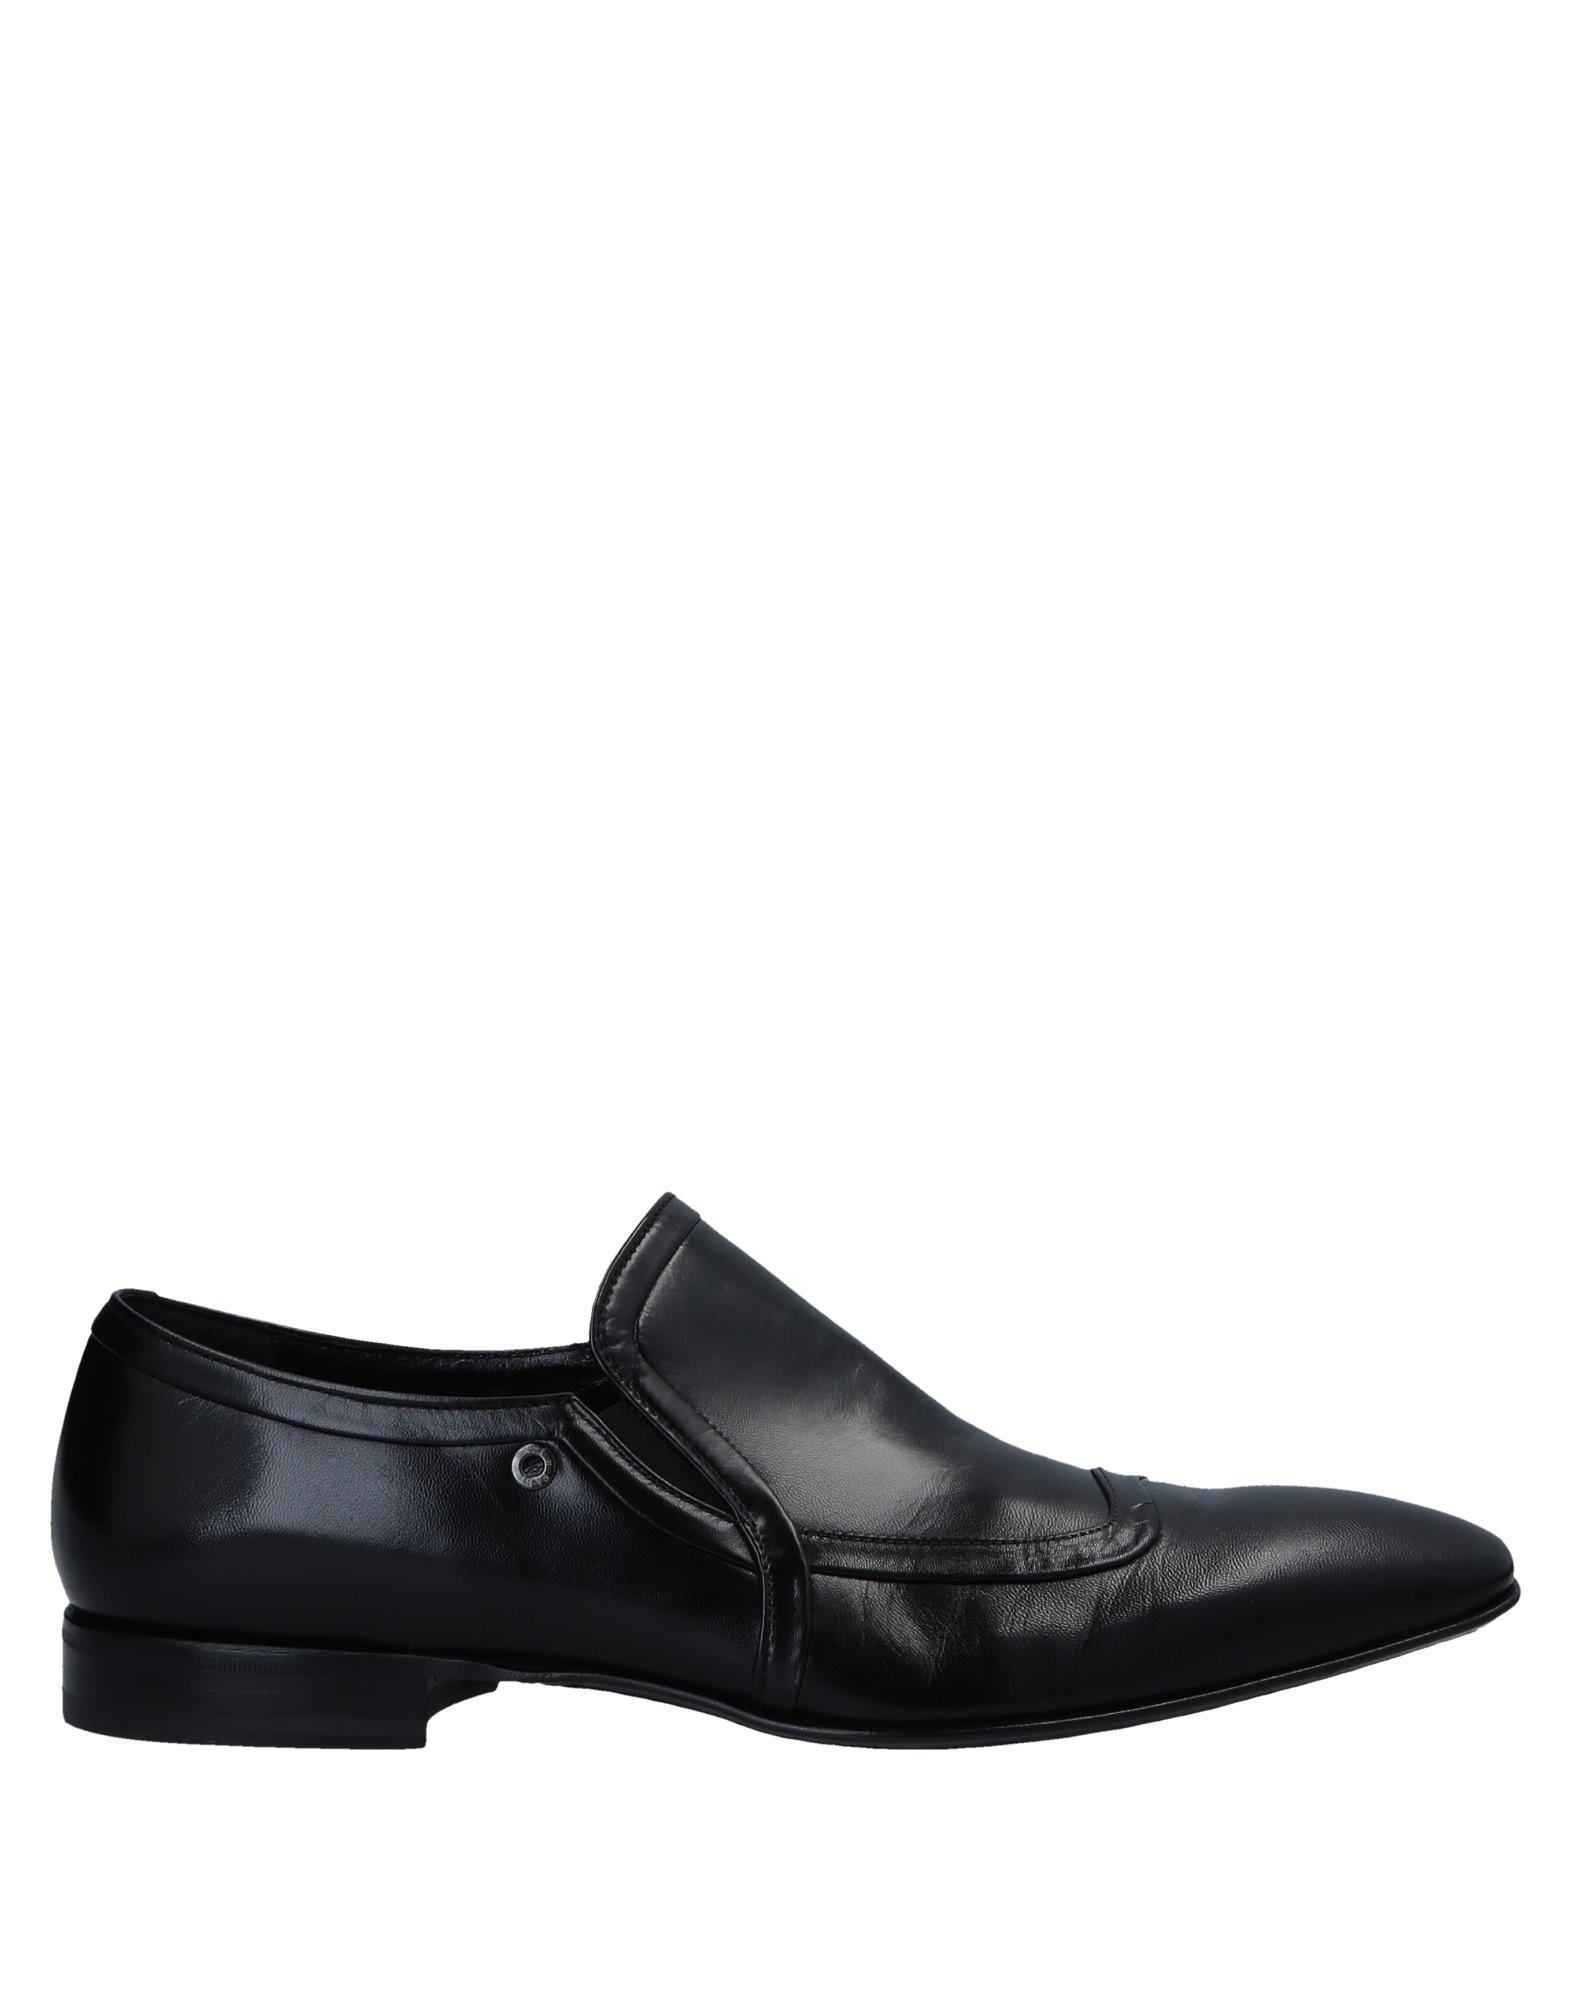 Fabi Mokassins Herren  11549982DT Gute Qualität beliebte Schuhe